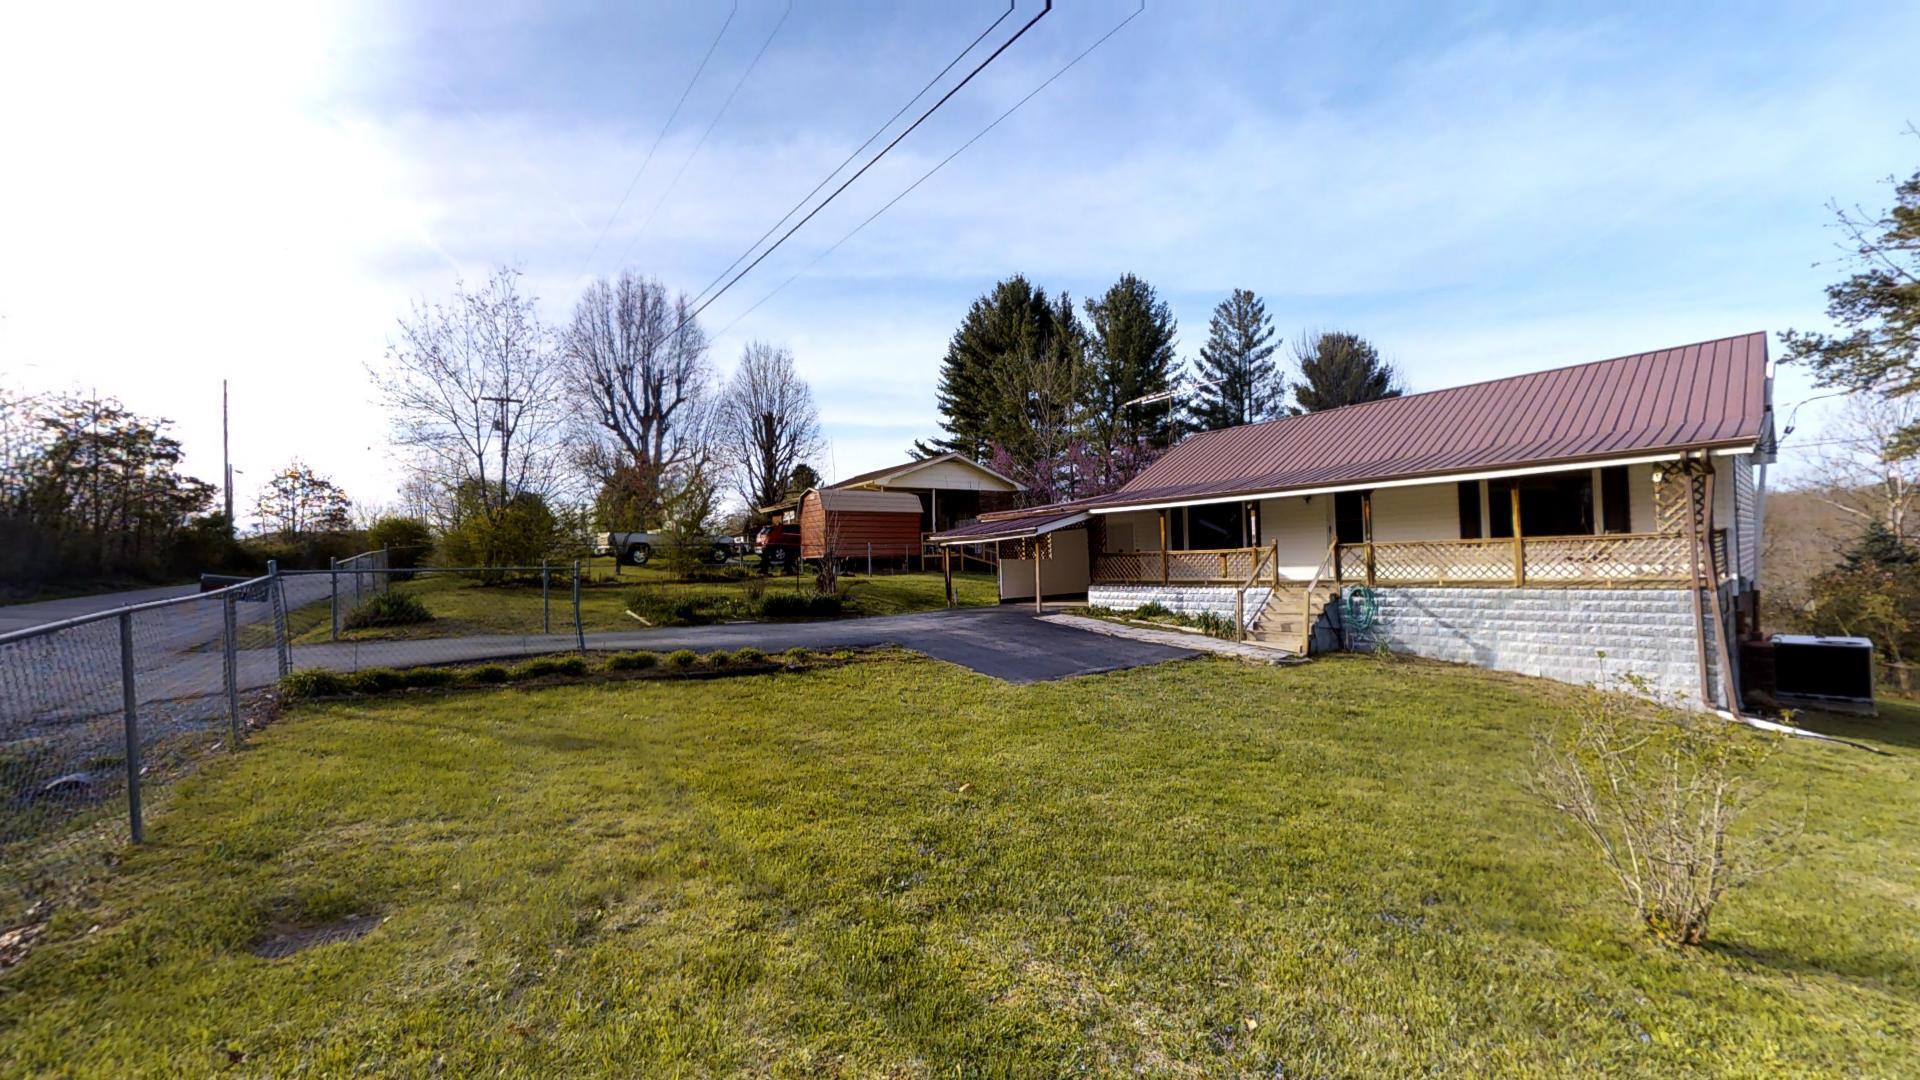 1117 Old Allardt Rd, Jamestown, TN 38556